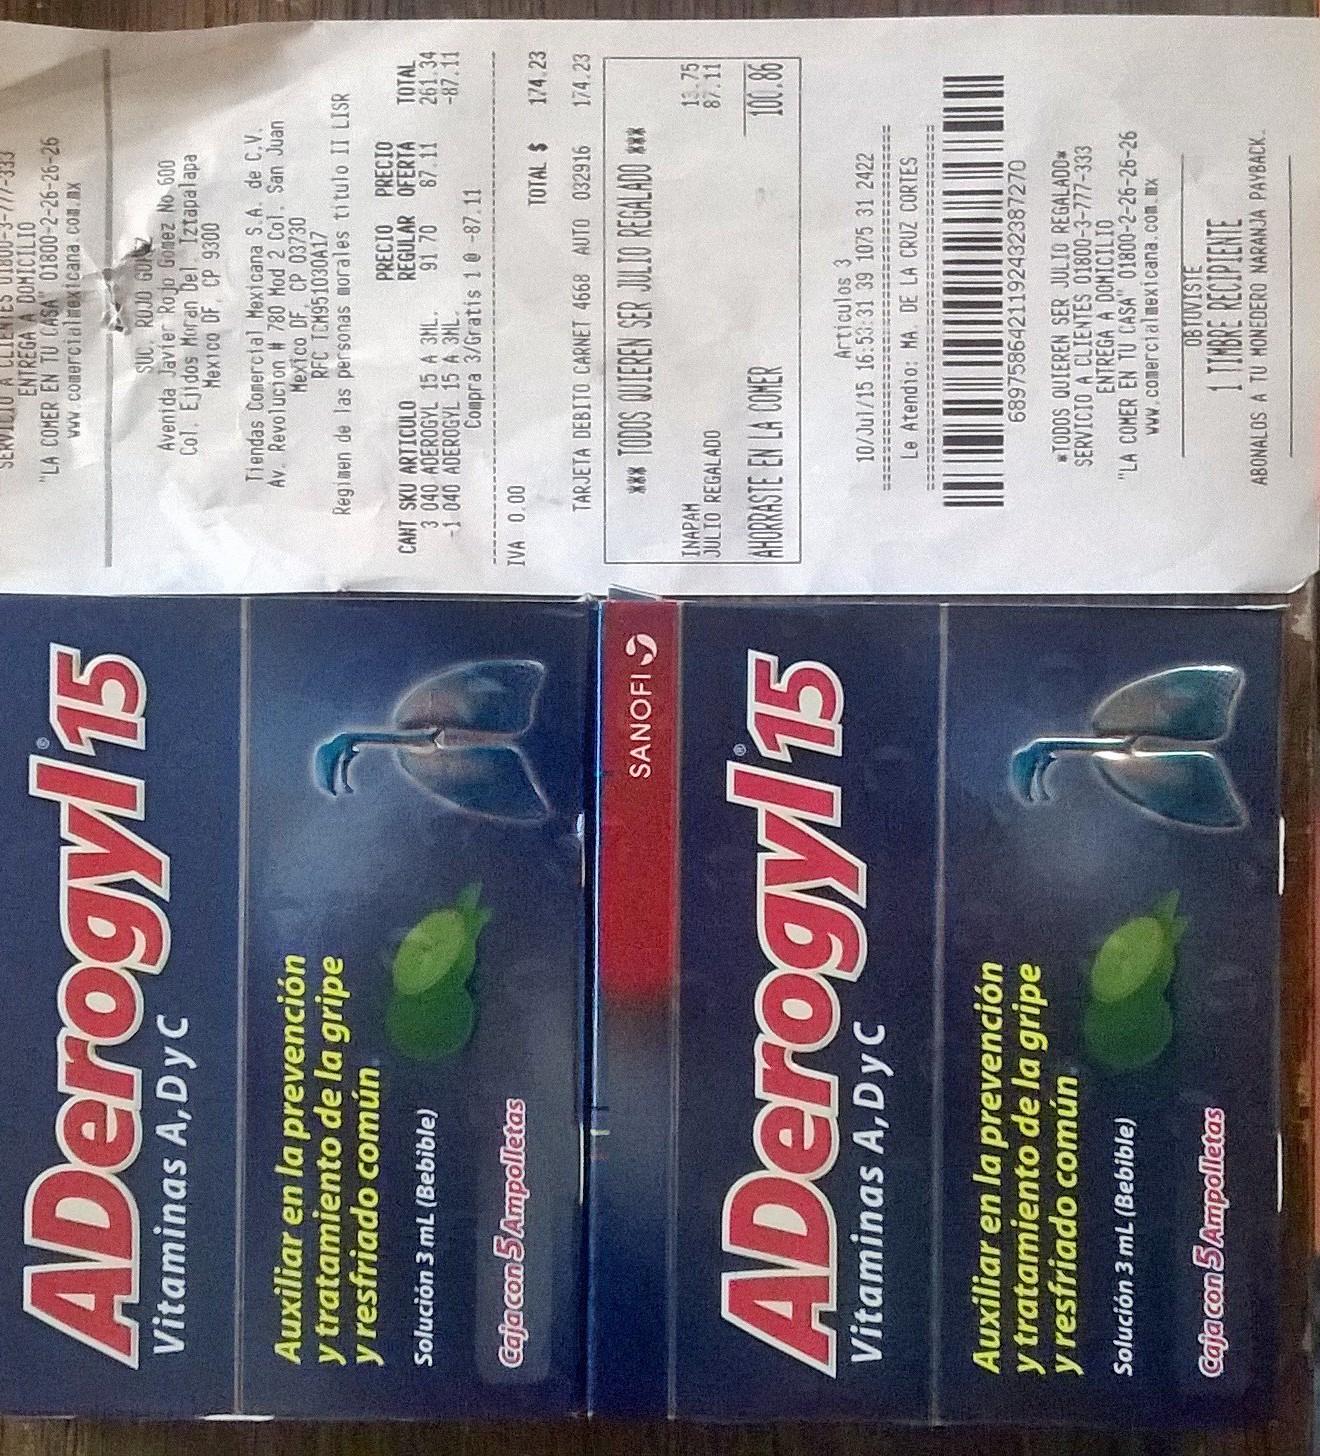 Comercial Mexicana Aderogyl (5Amp) $58 Comprando 3 (Regular $90)